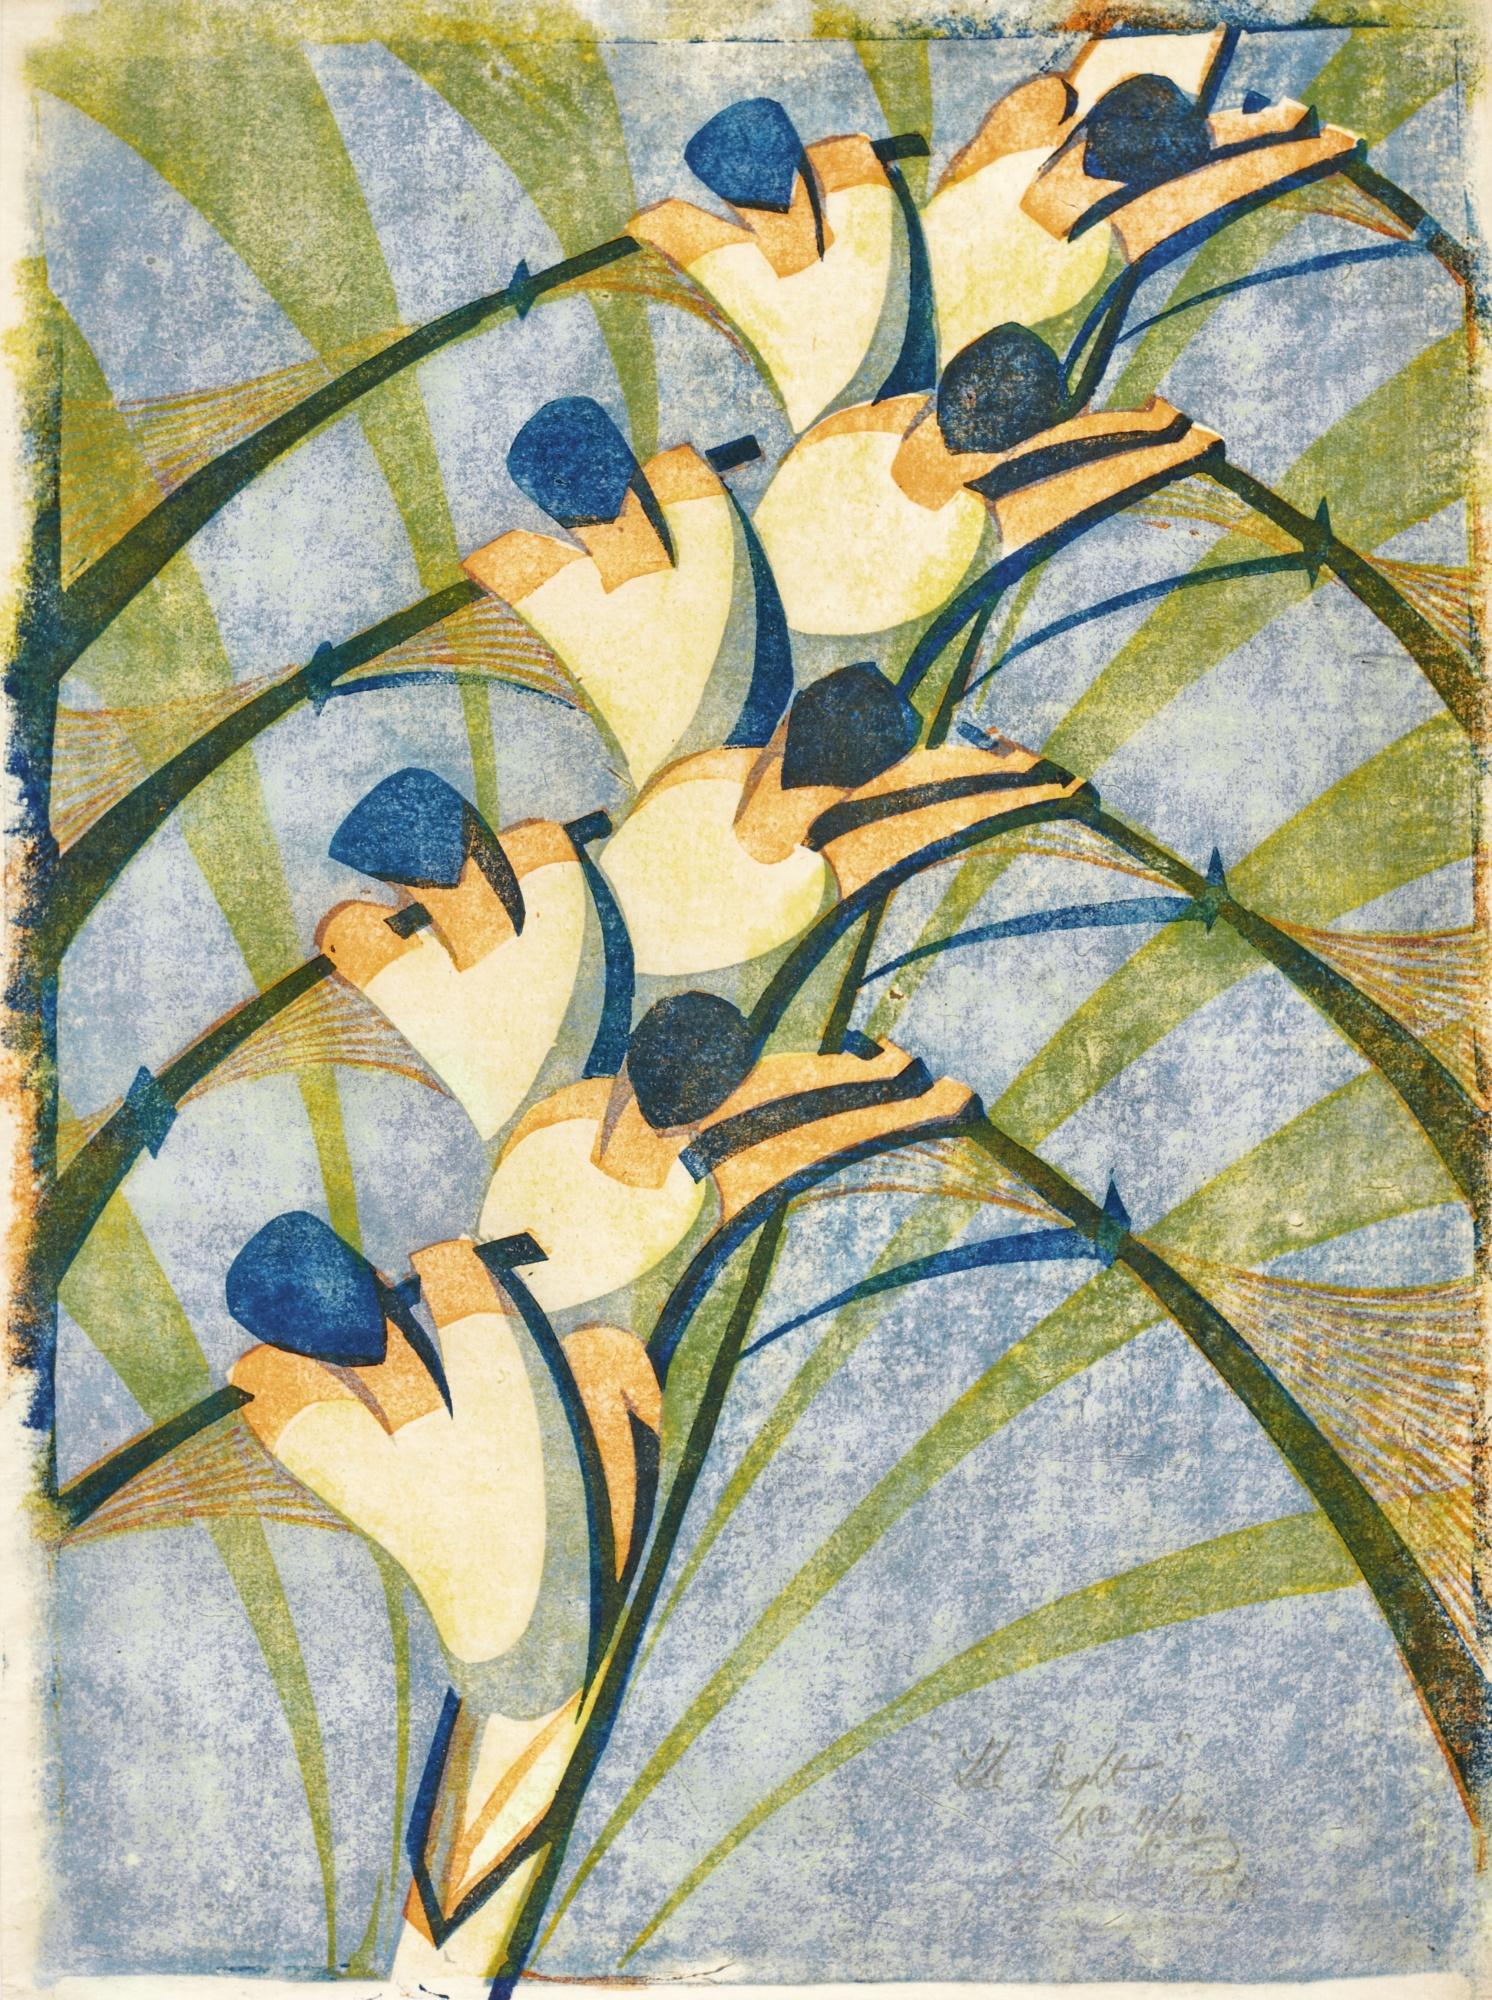 Cyril Edward Power-The Eight (C. Cep 18)-1930